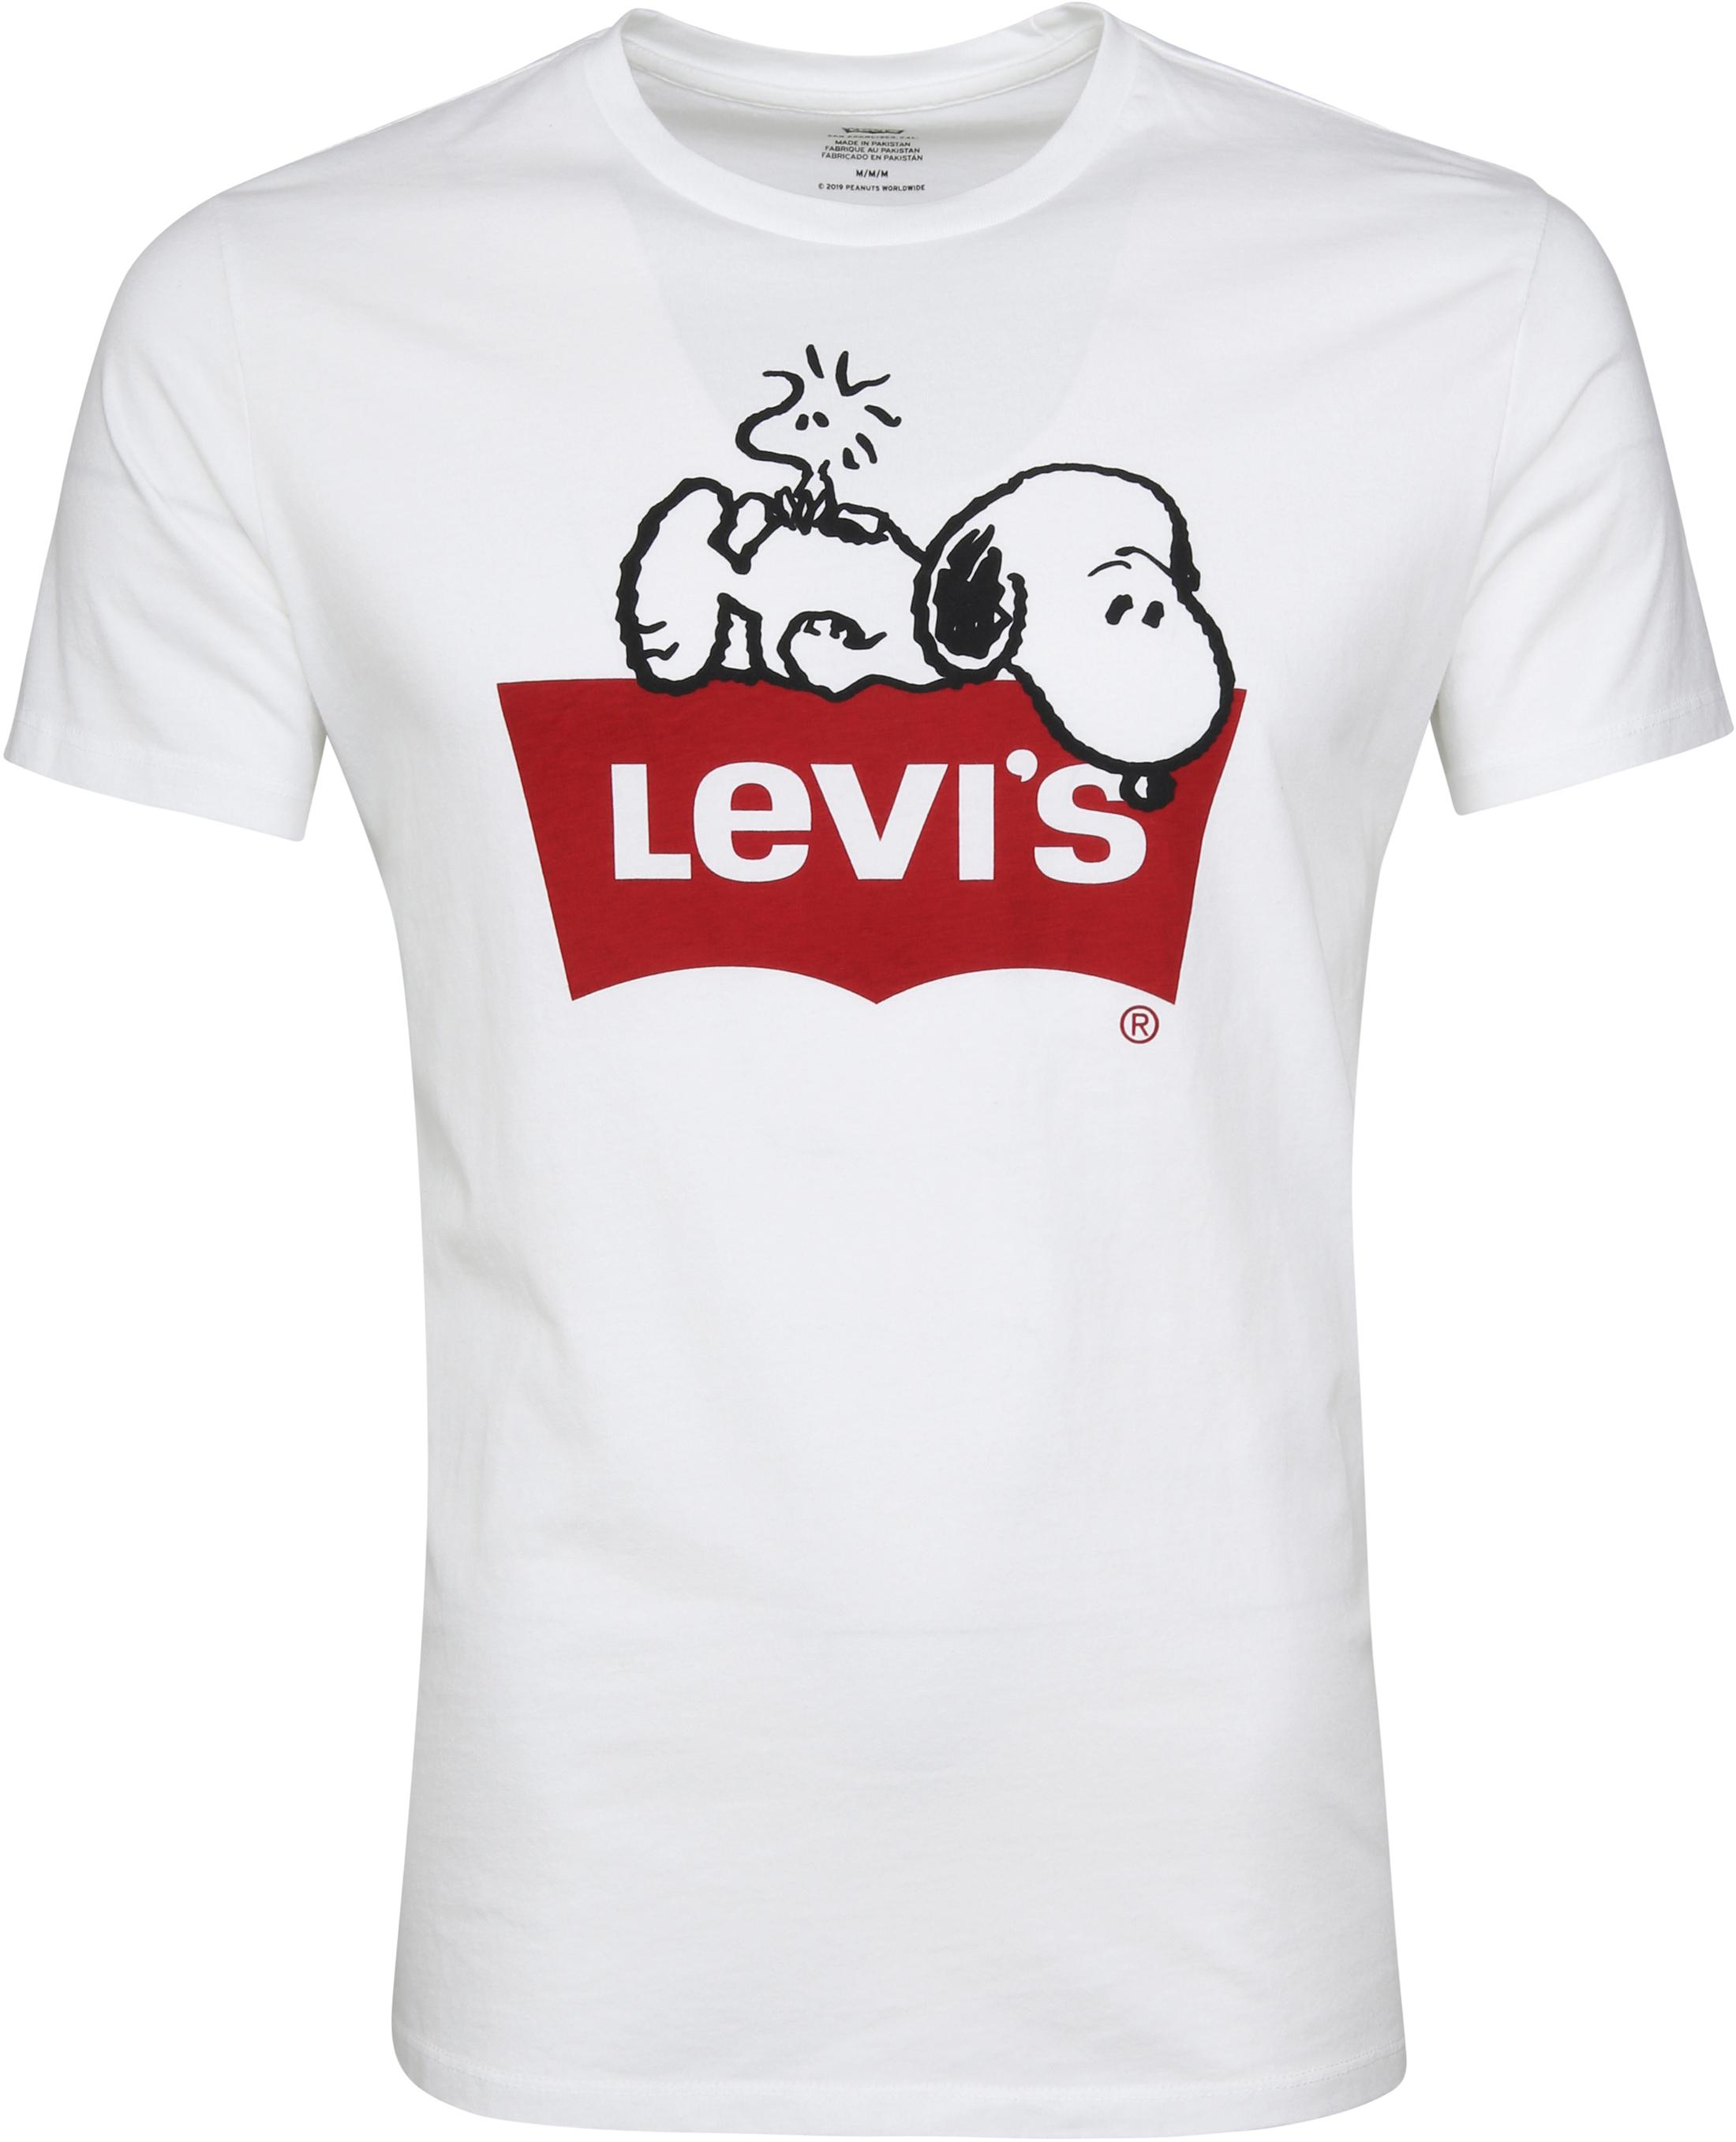 6d7ddc994 Levi's T-shirt Snoopy White 22491-0512 order online | Suitable